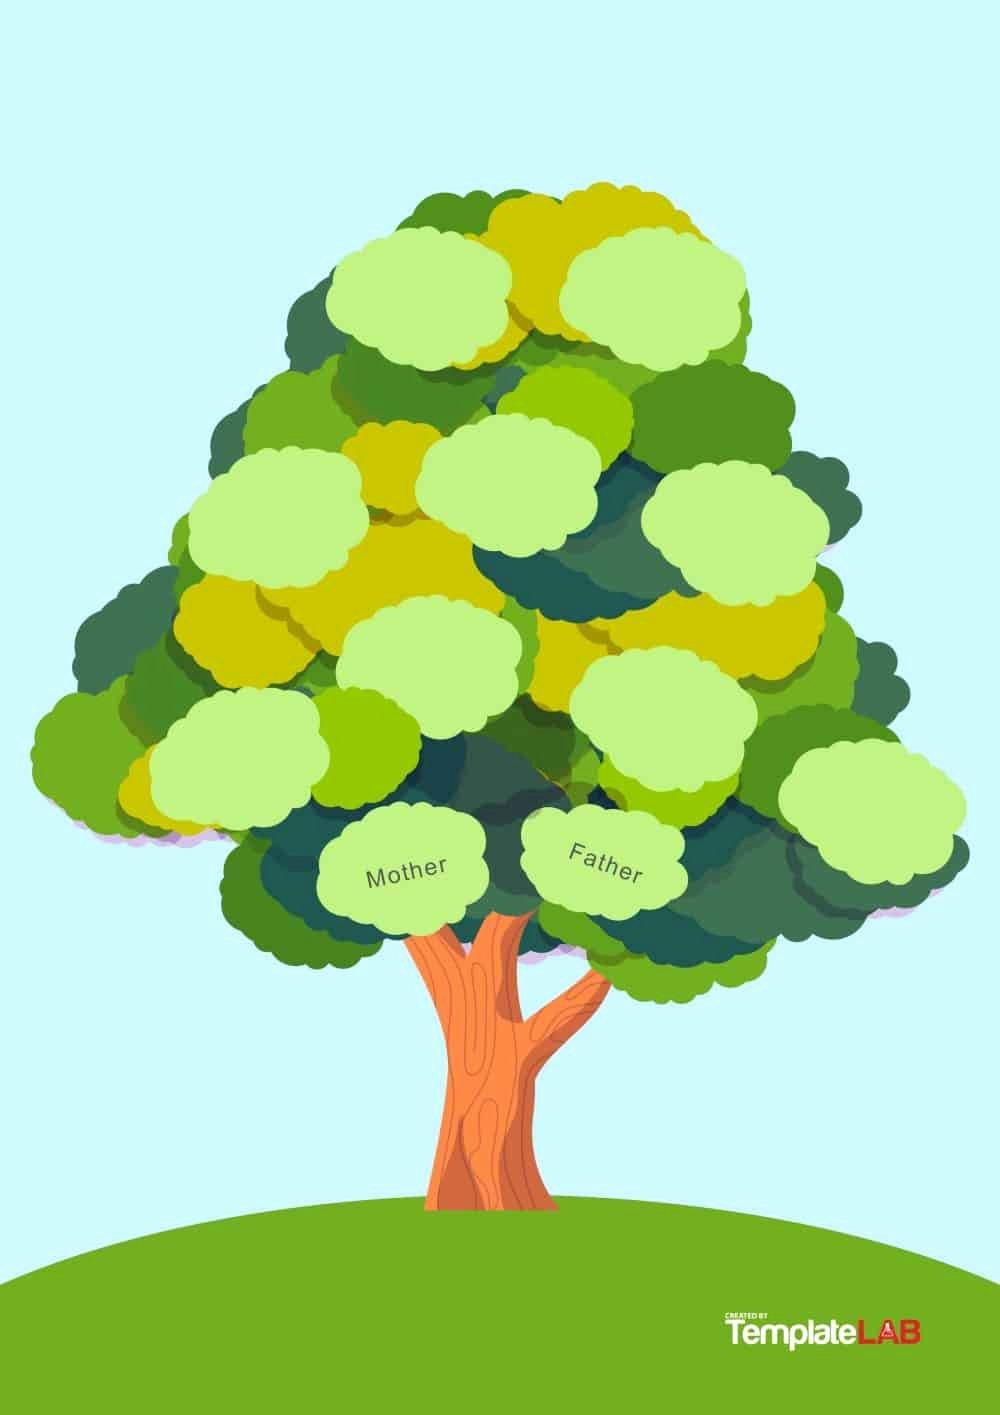 Free Family Tree Template Word Beautiful 50 Free Family Tree Templates Word Excel Pdf